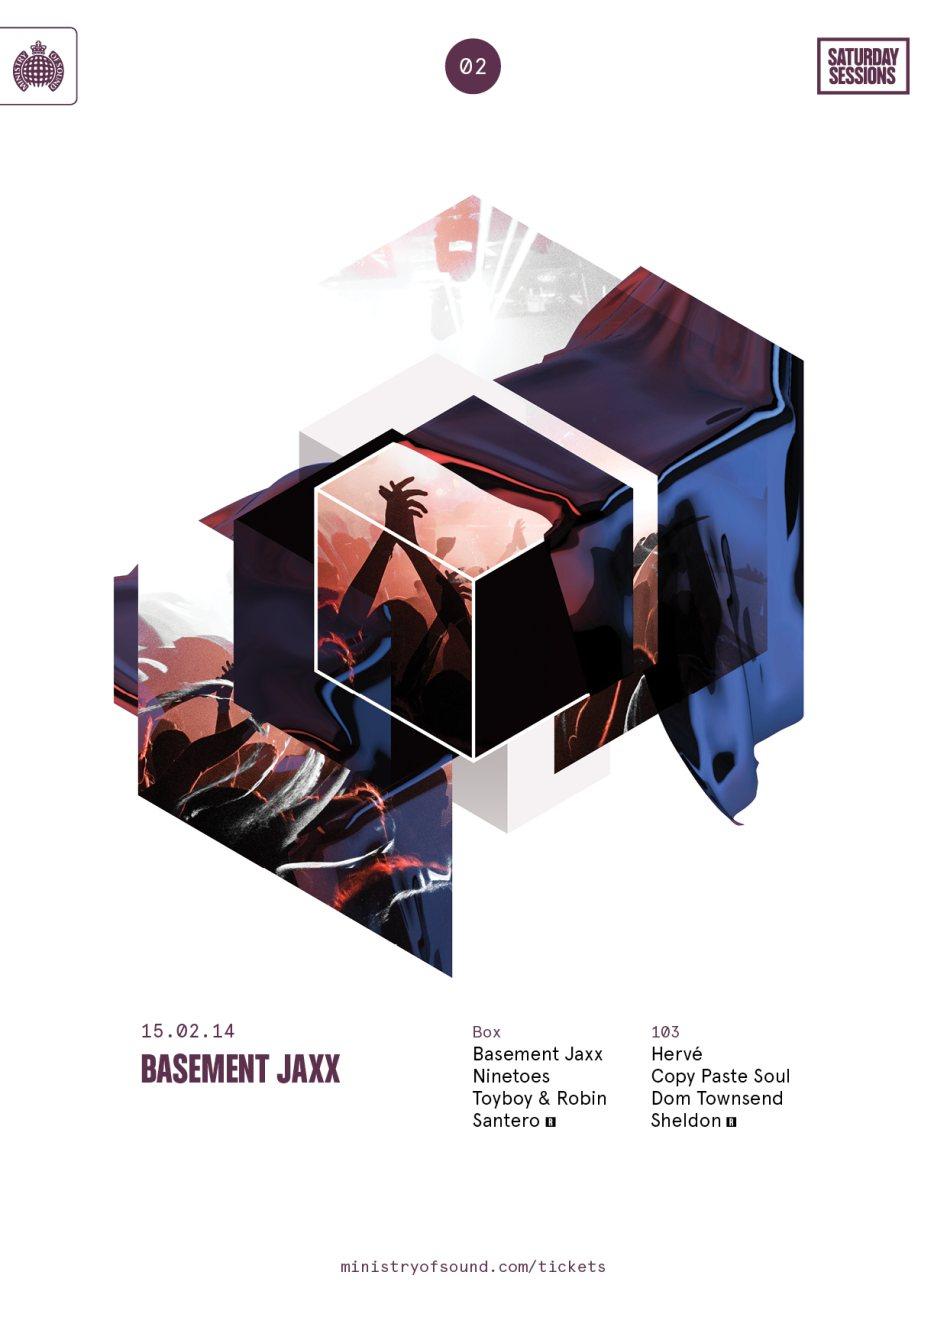 ra saturday sessions basement jaxx at ministry of sound london